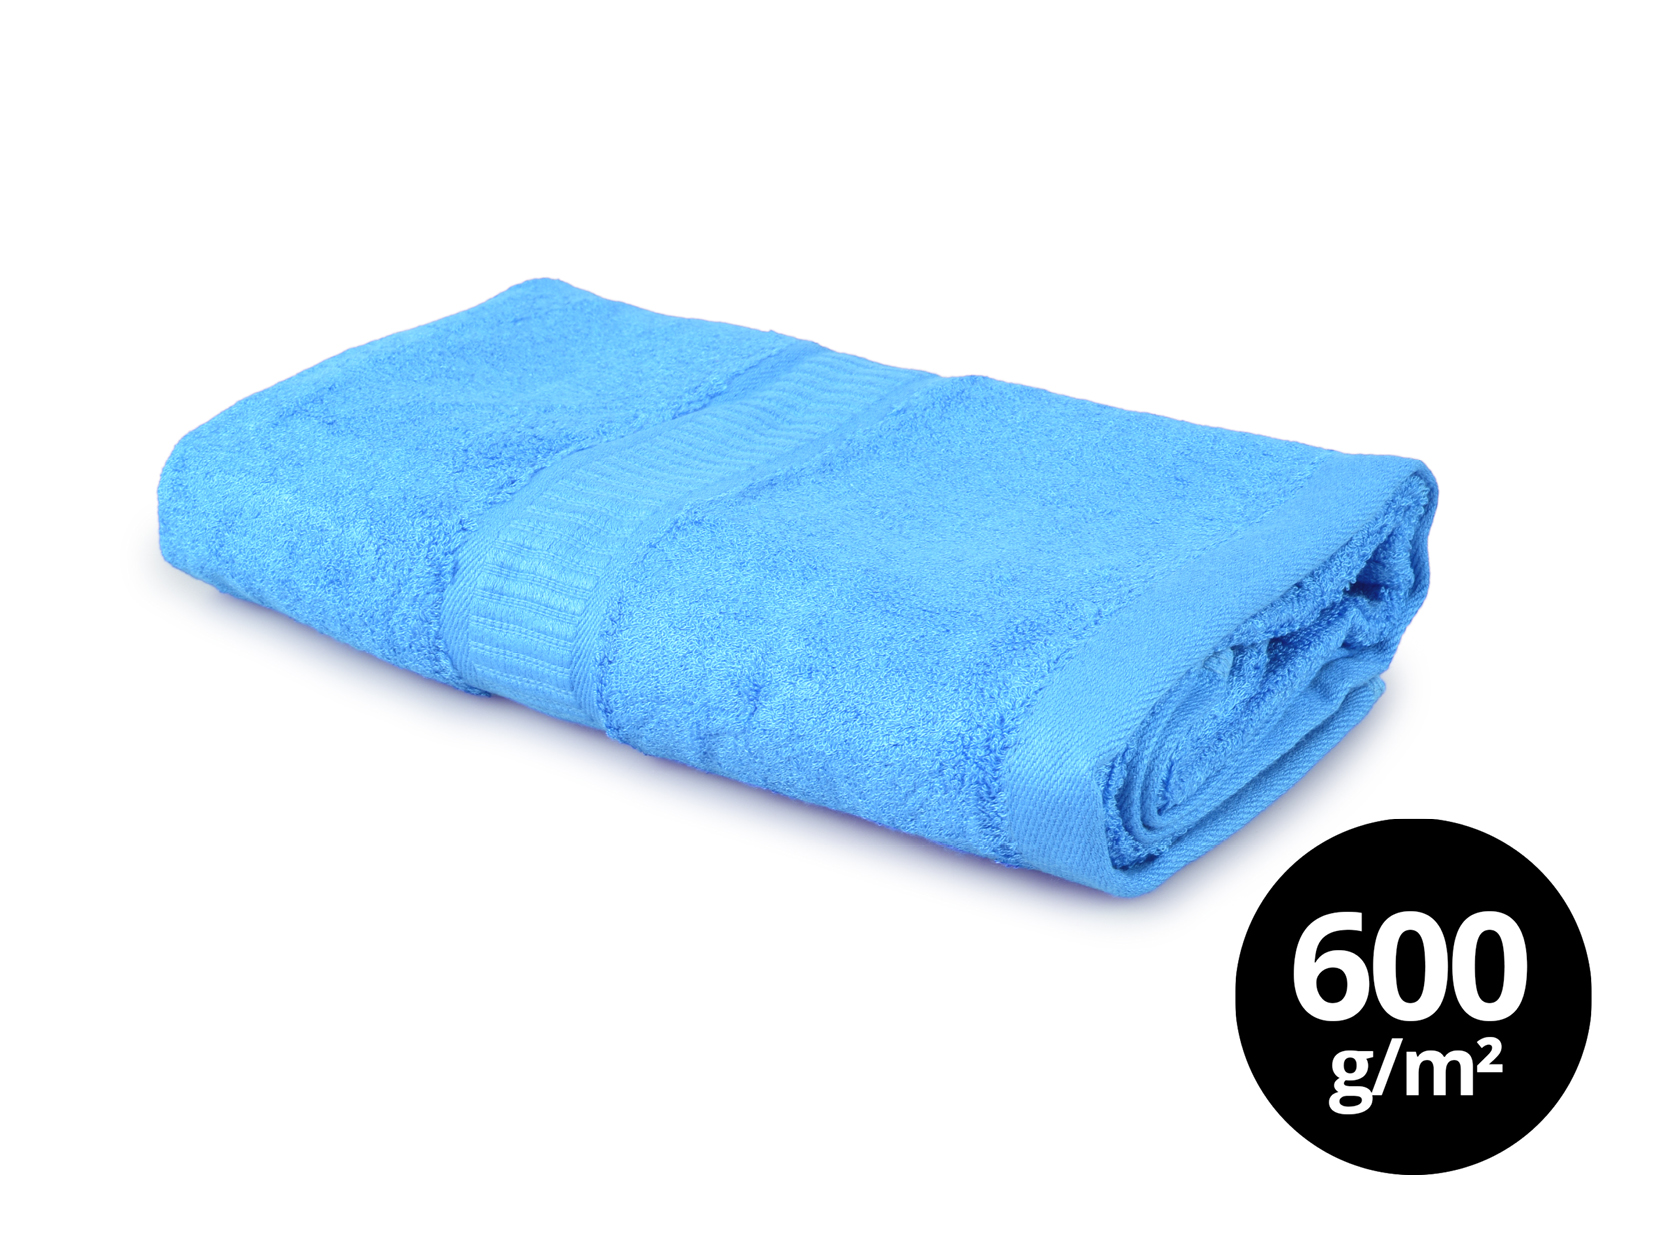 BAMBOO du¿y rêcznik, z eleganck± bordiur± niebieski